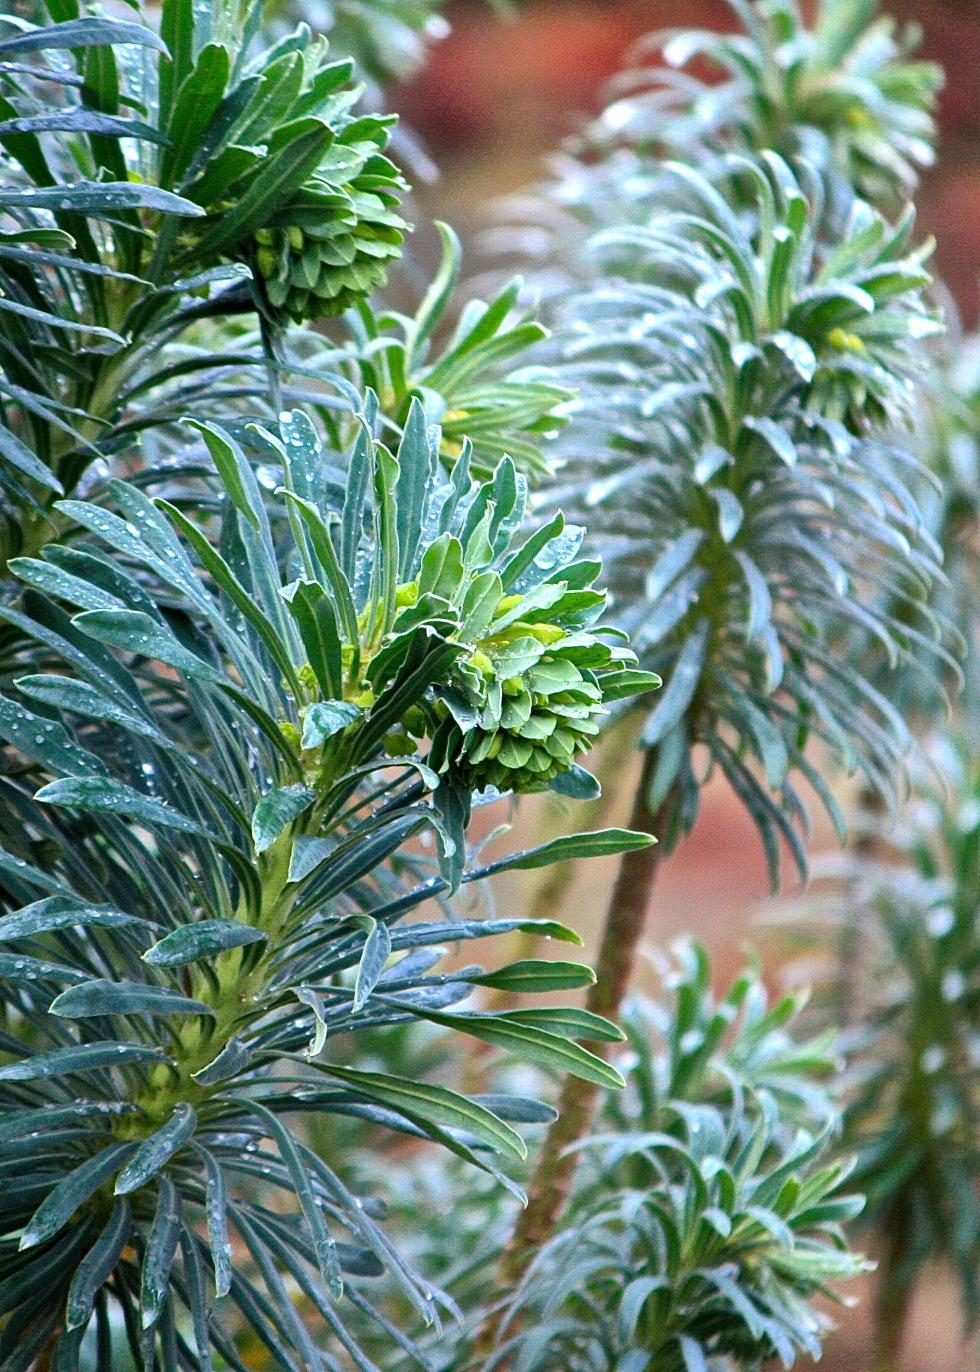 Euphorbia characias subsp. wulfenii, Waterlow Park, December 2013